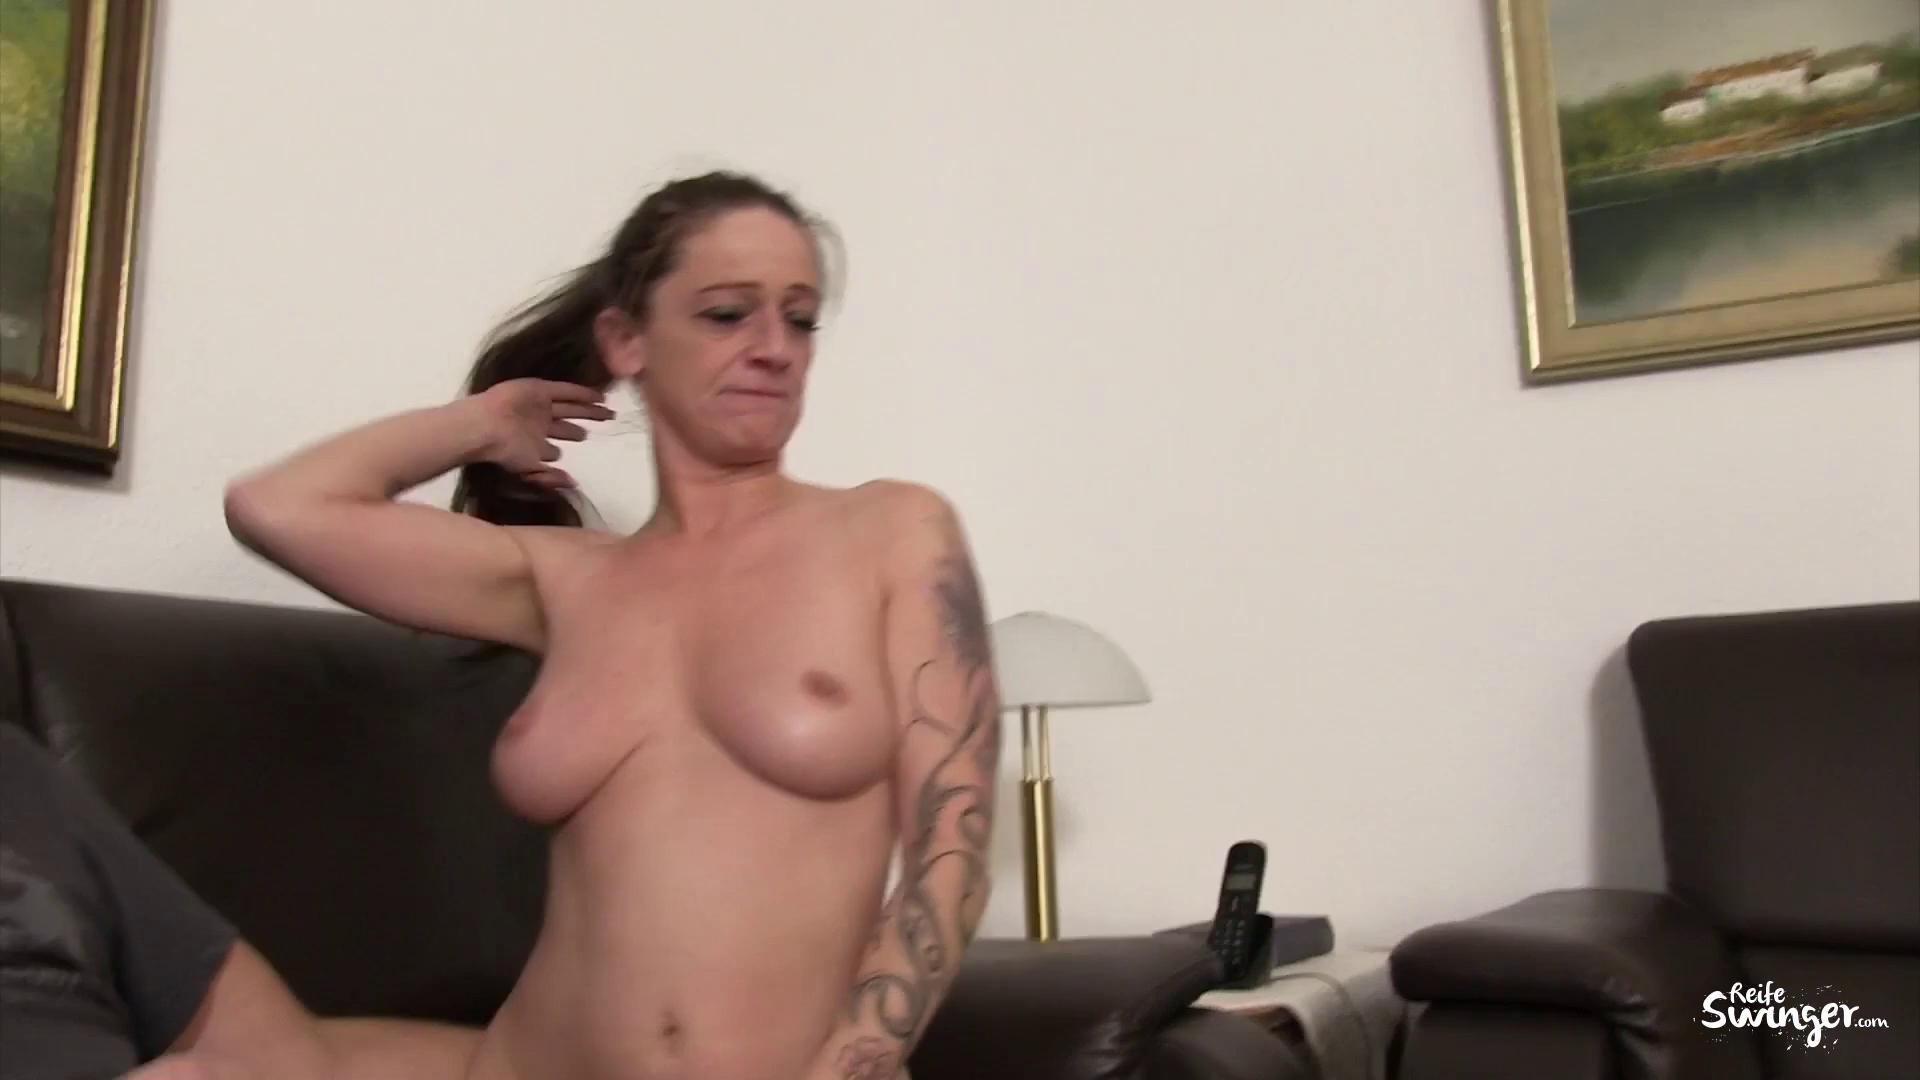 ReifeSwinger – Adrienne Kiss